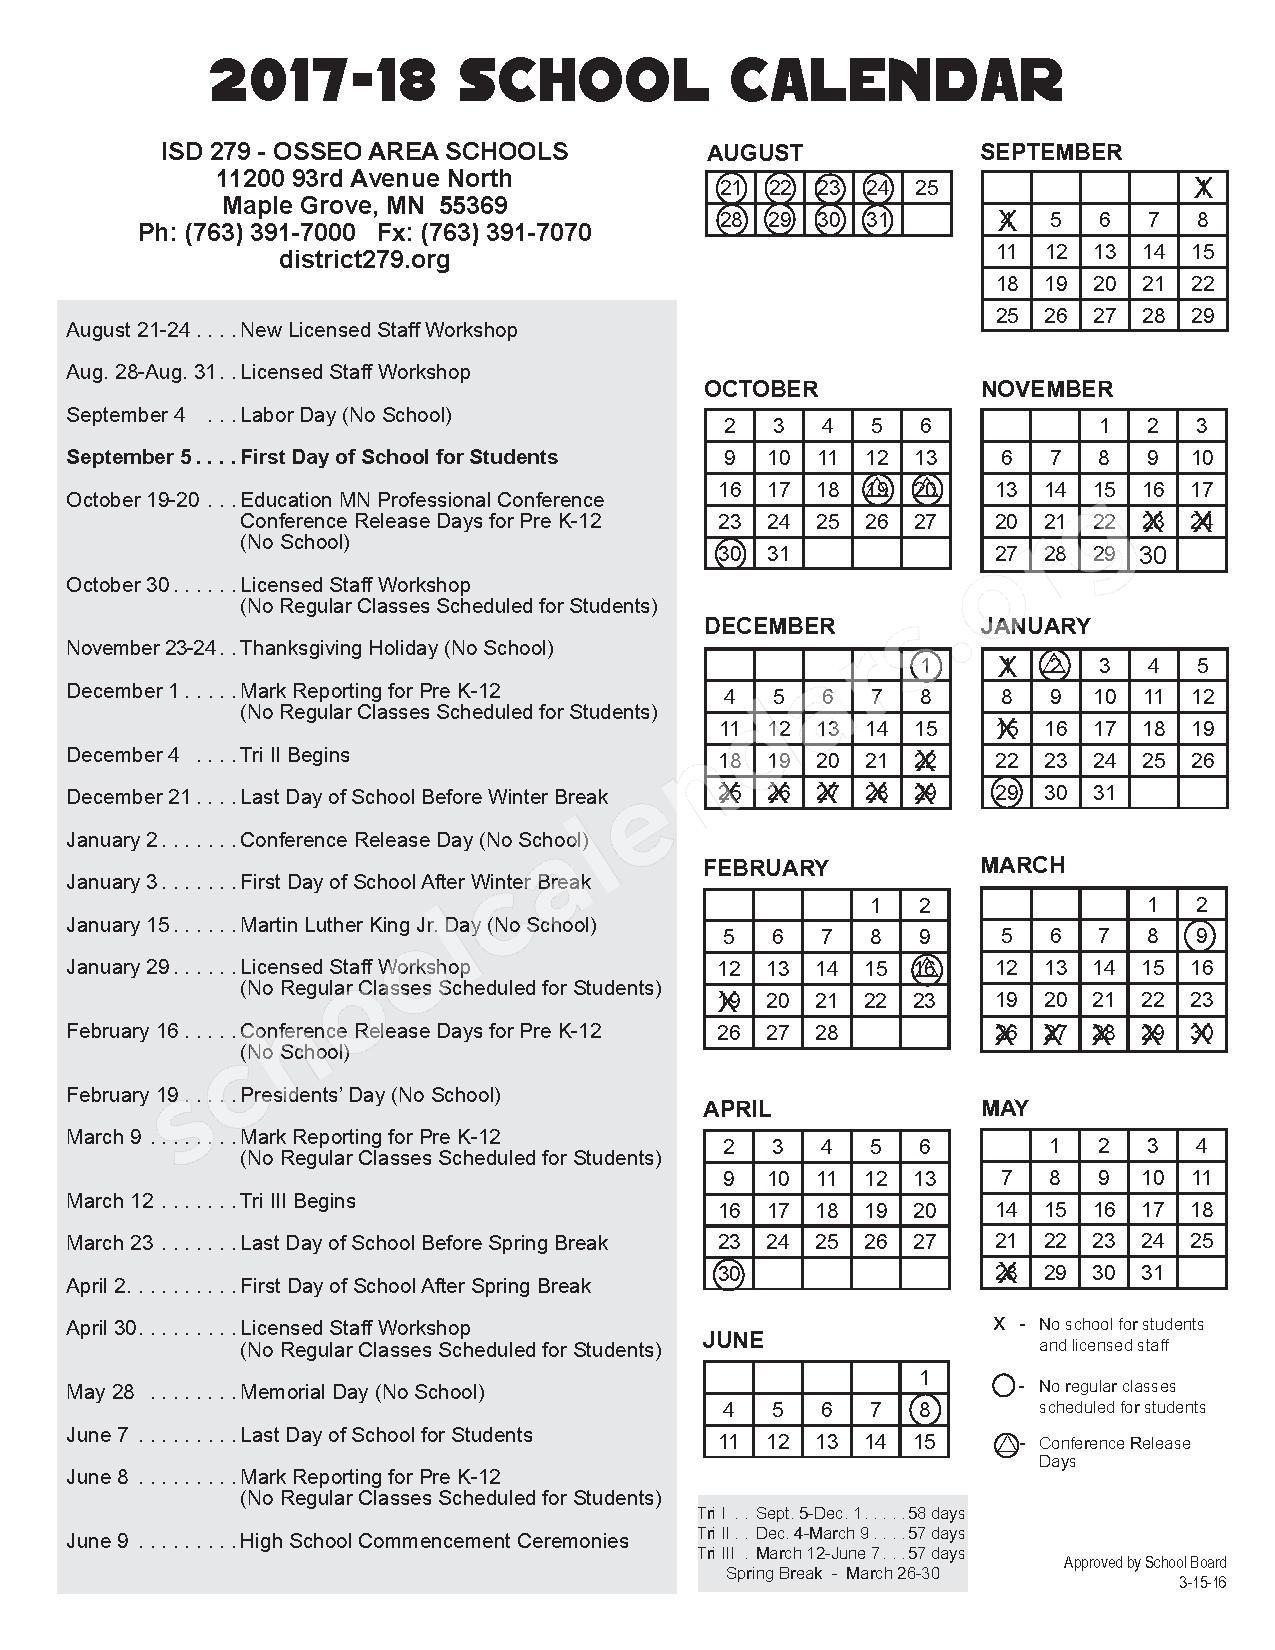 2017 - 2018 School Calendar – Zanewood Community School – page 1